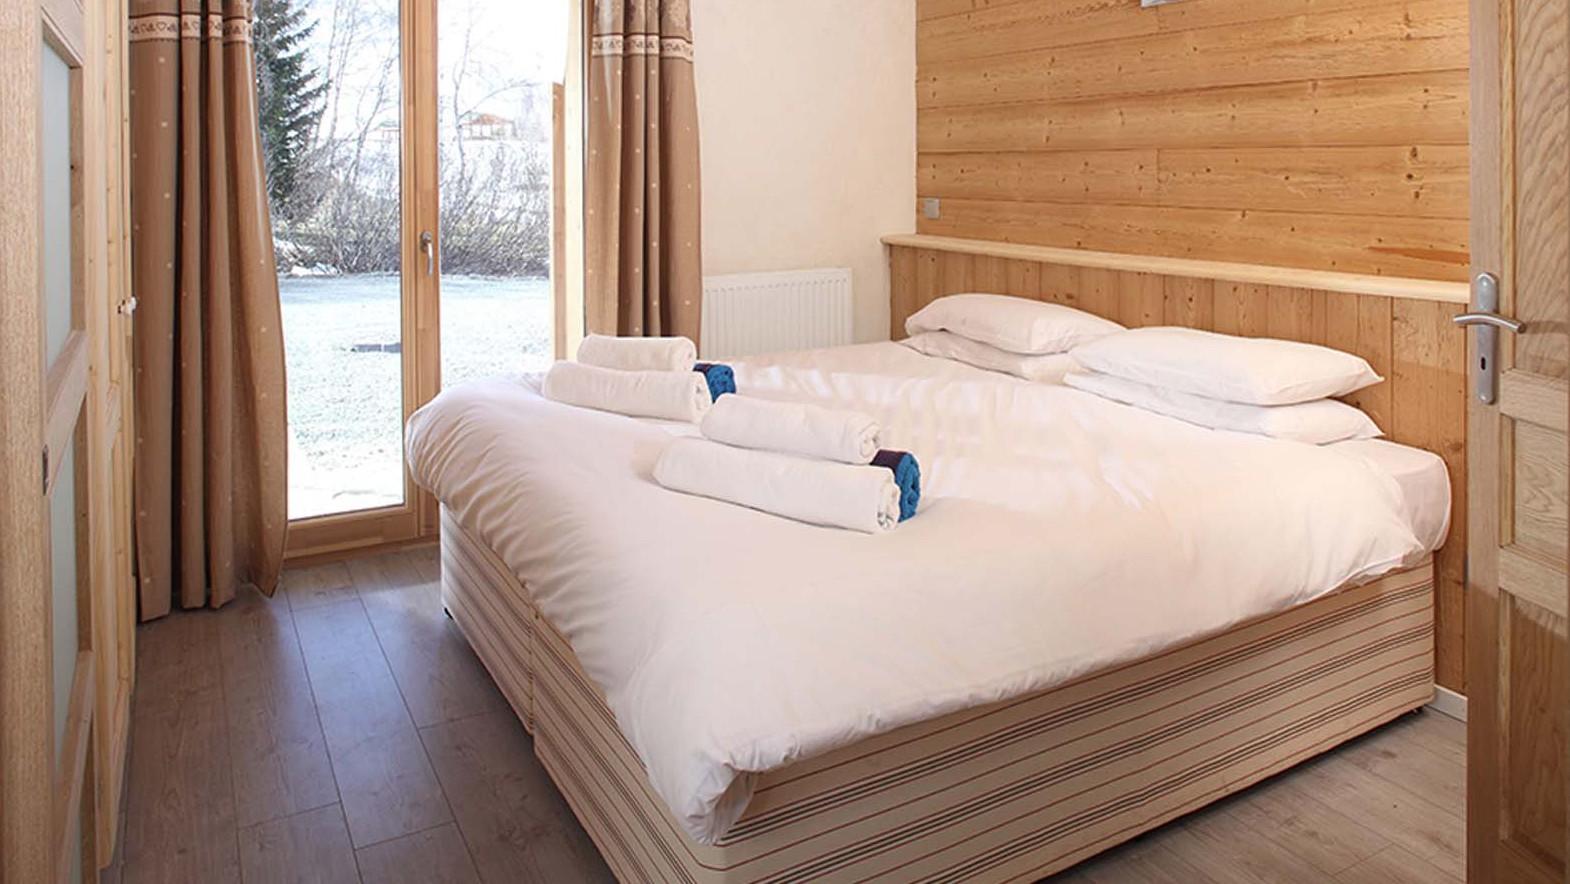 Double Bedroom, Chalet Friandise, Alpe D'Huez, France